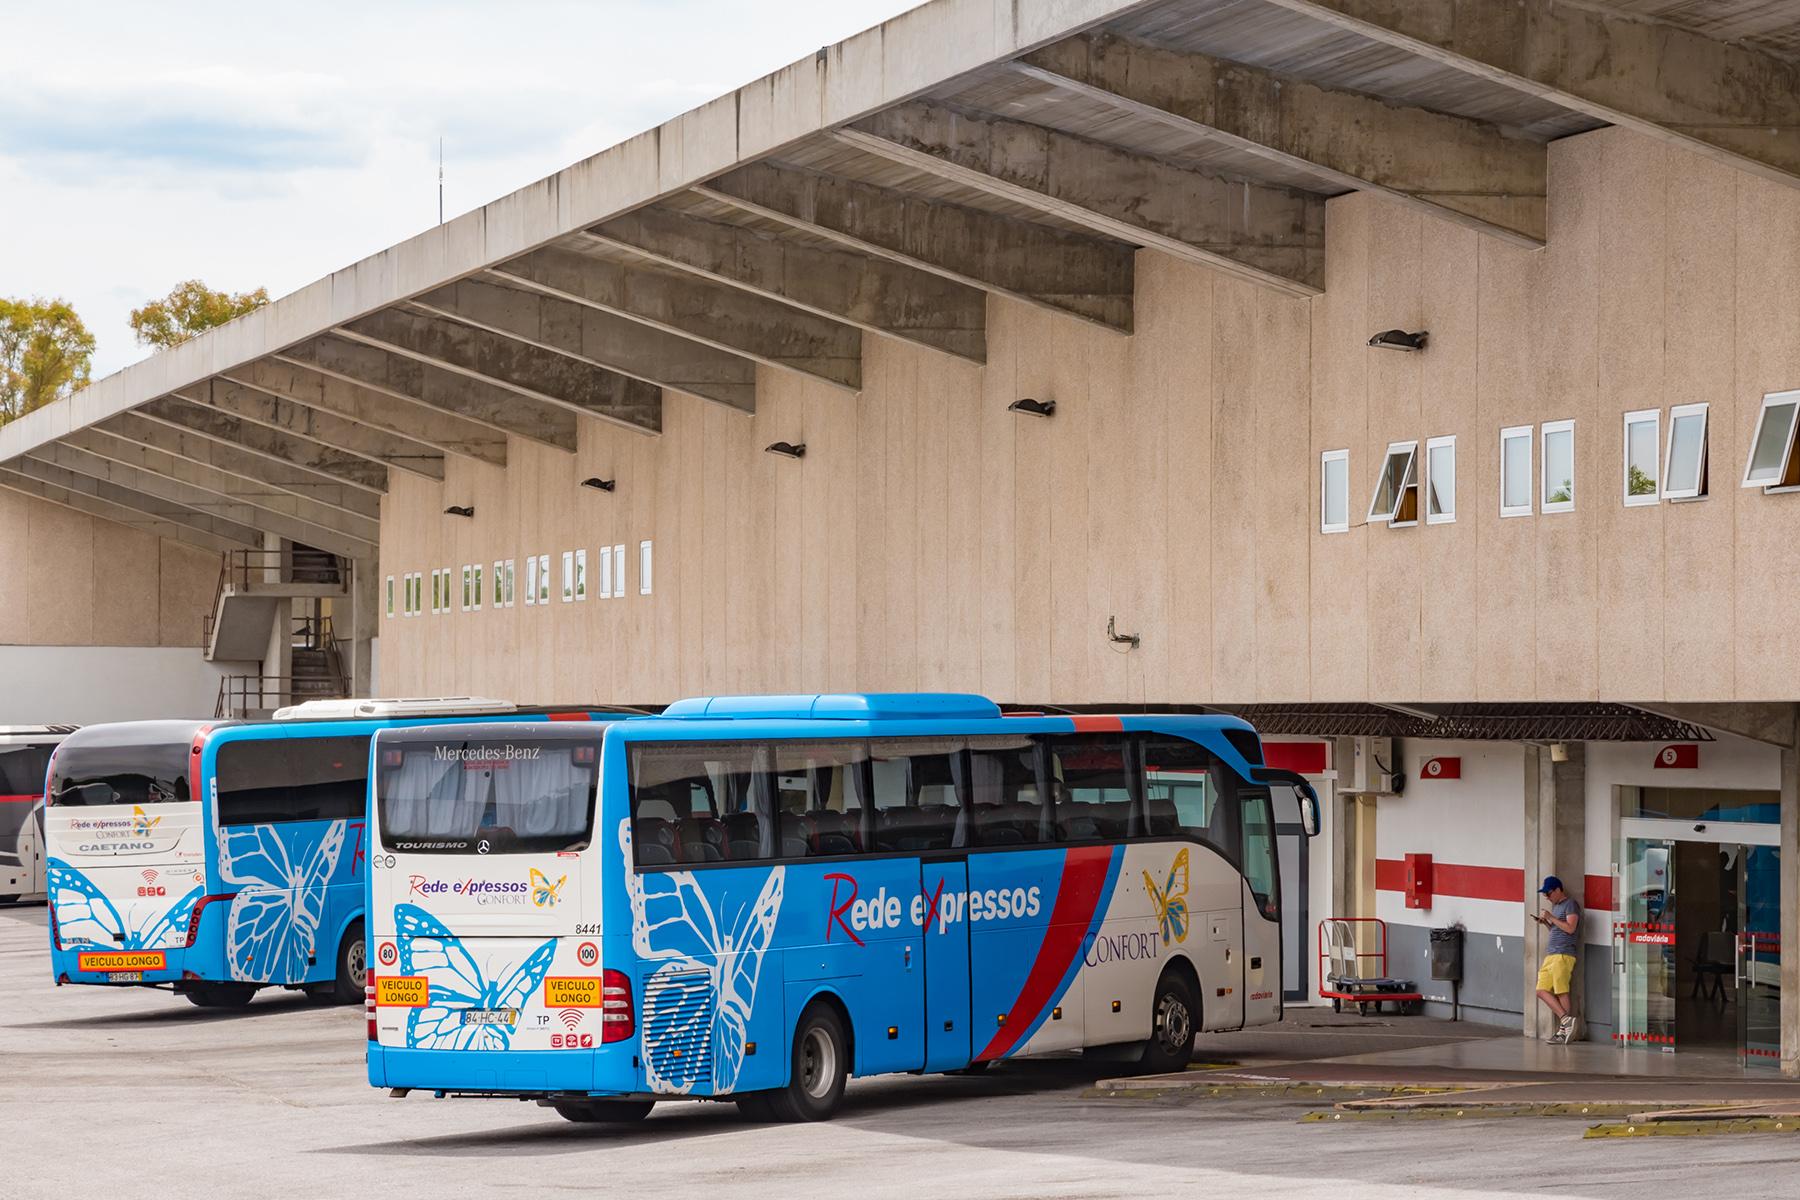 Rede buses in Evora